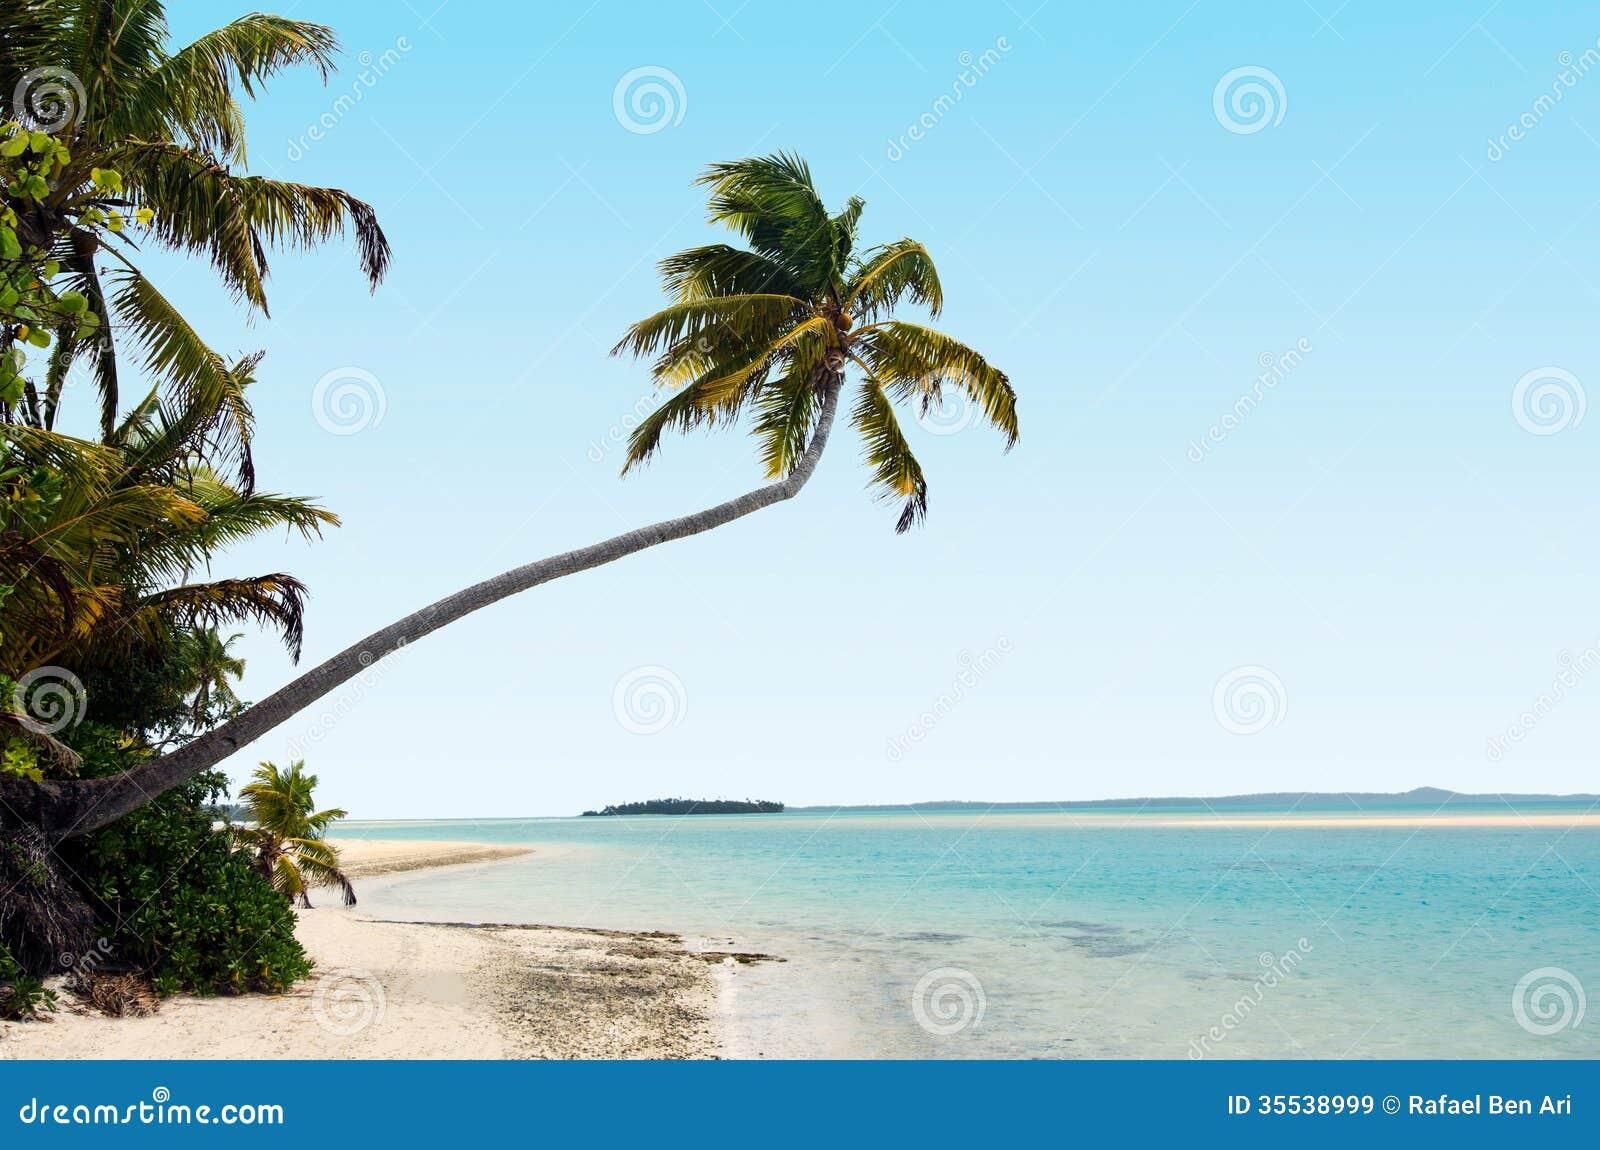 Lagoon Tropical Island: Coconut Trees On Deserted Tropical Island Stock Image